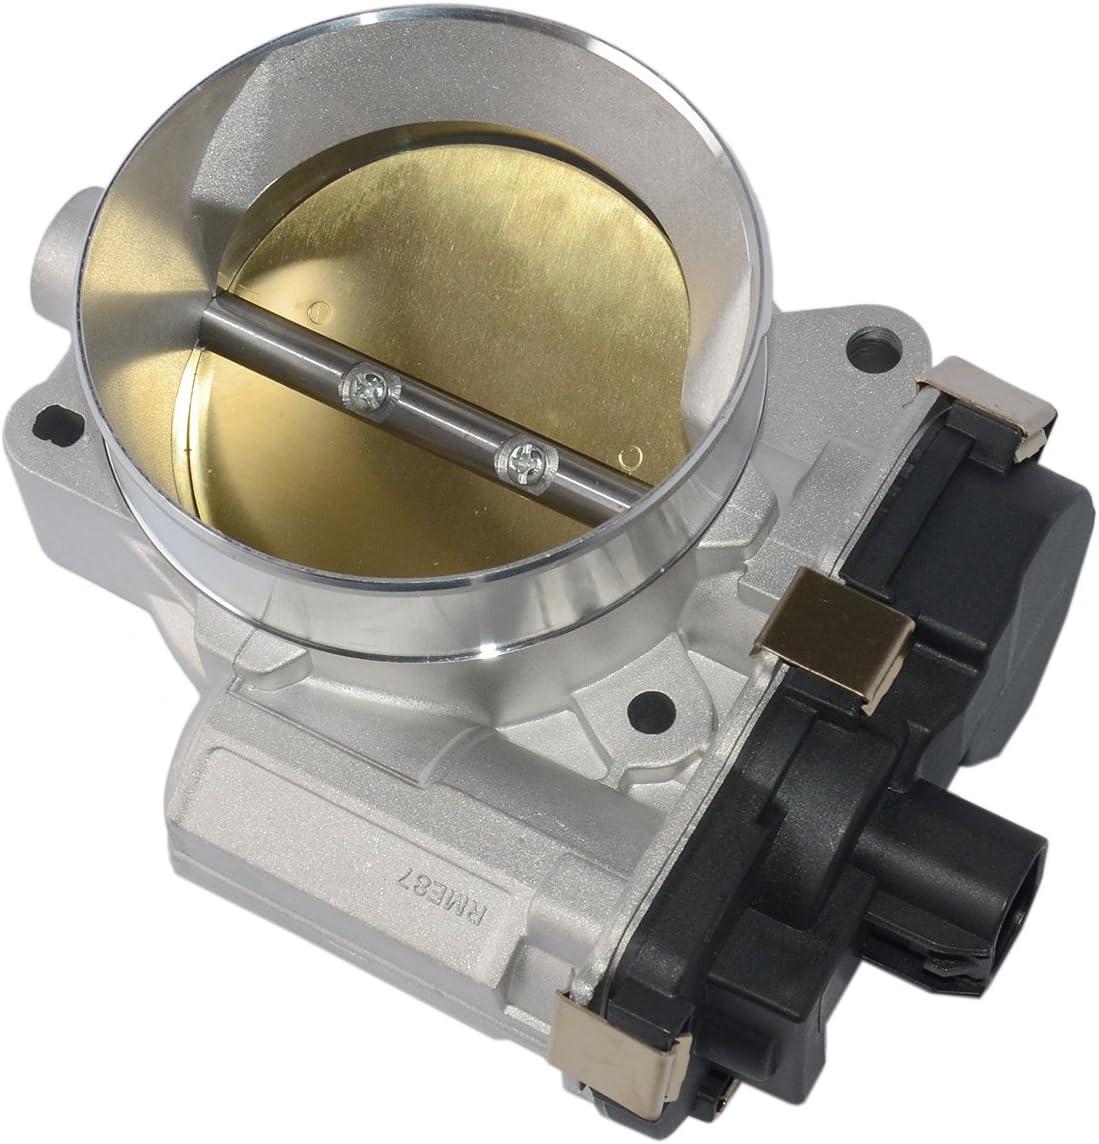 ETB0024 Throttle Body Fuel Injection HITACHI  S20008 217-2422 12580760 12572658